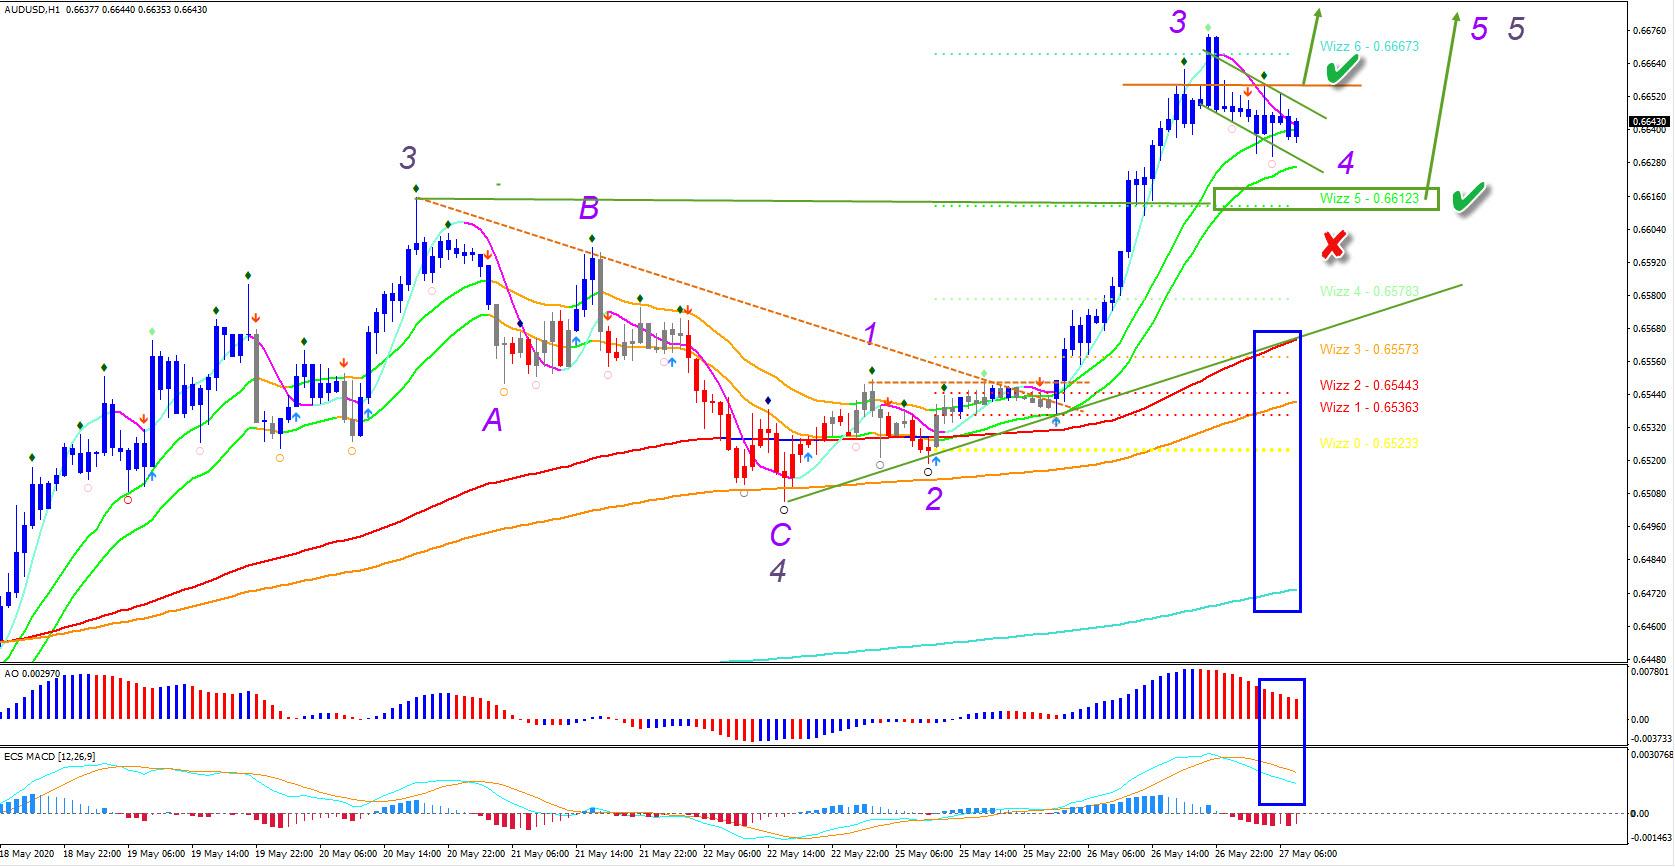 AUD/USD 1 hour chart